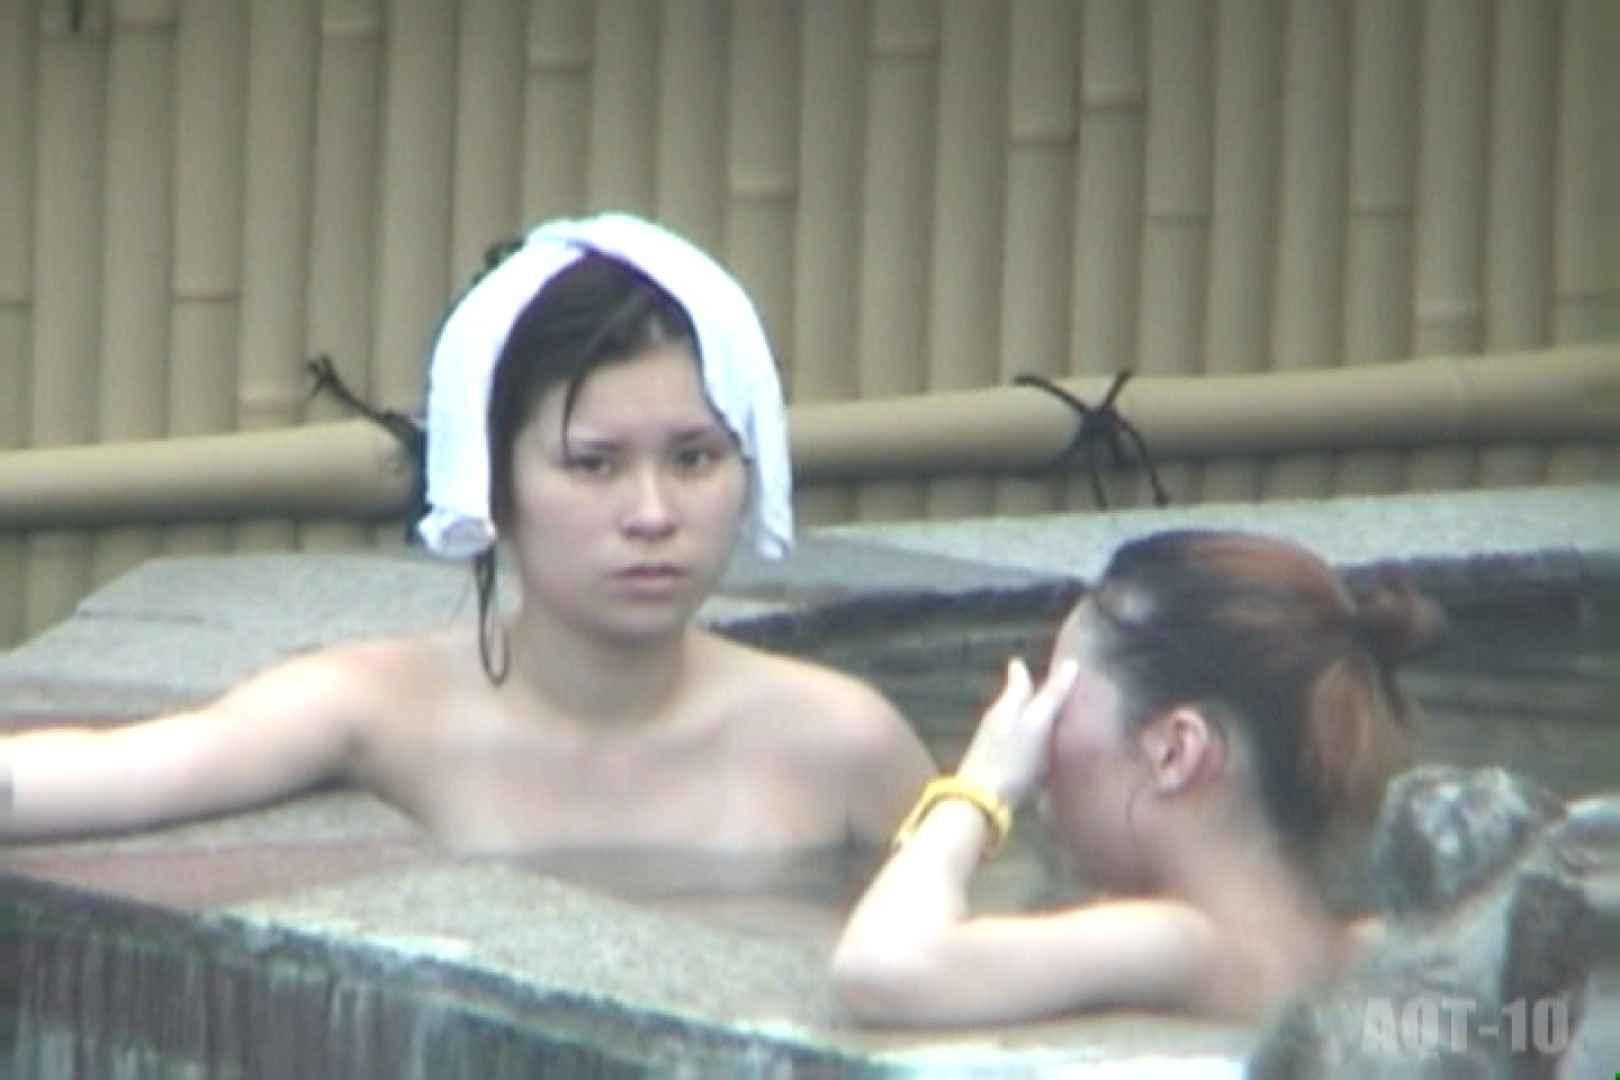 Aquaな露天風呂Vol.792 OLのエロ生活 SEX無修正画像 33連発 29